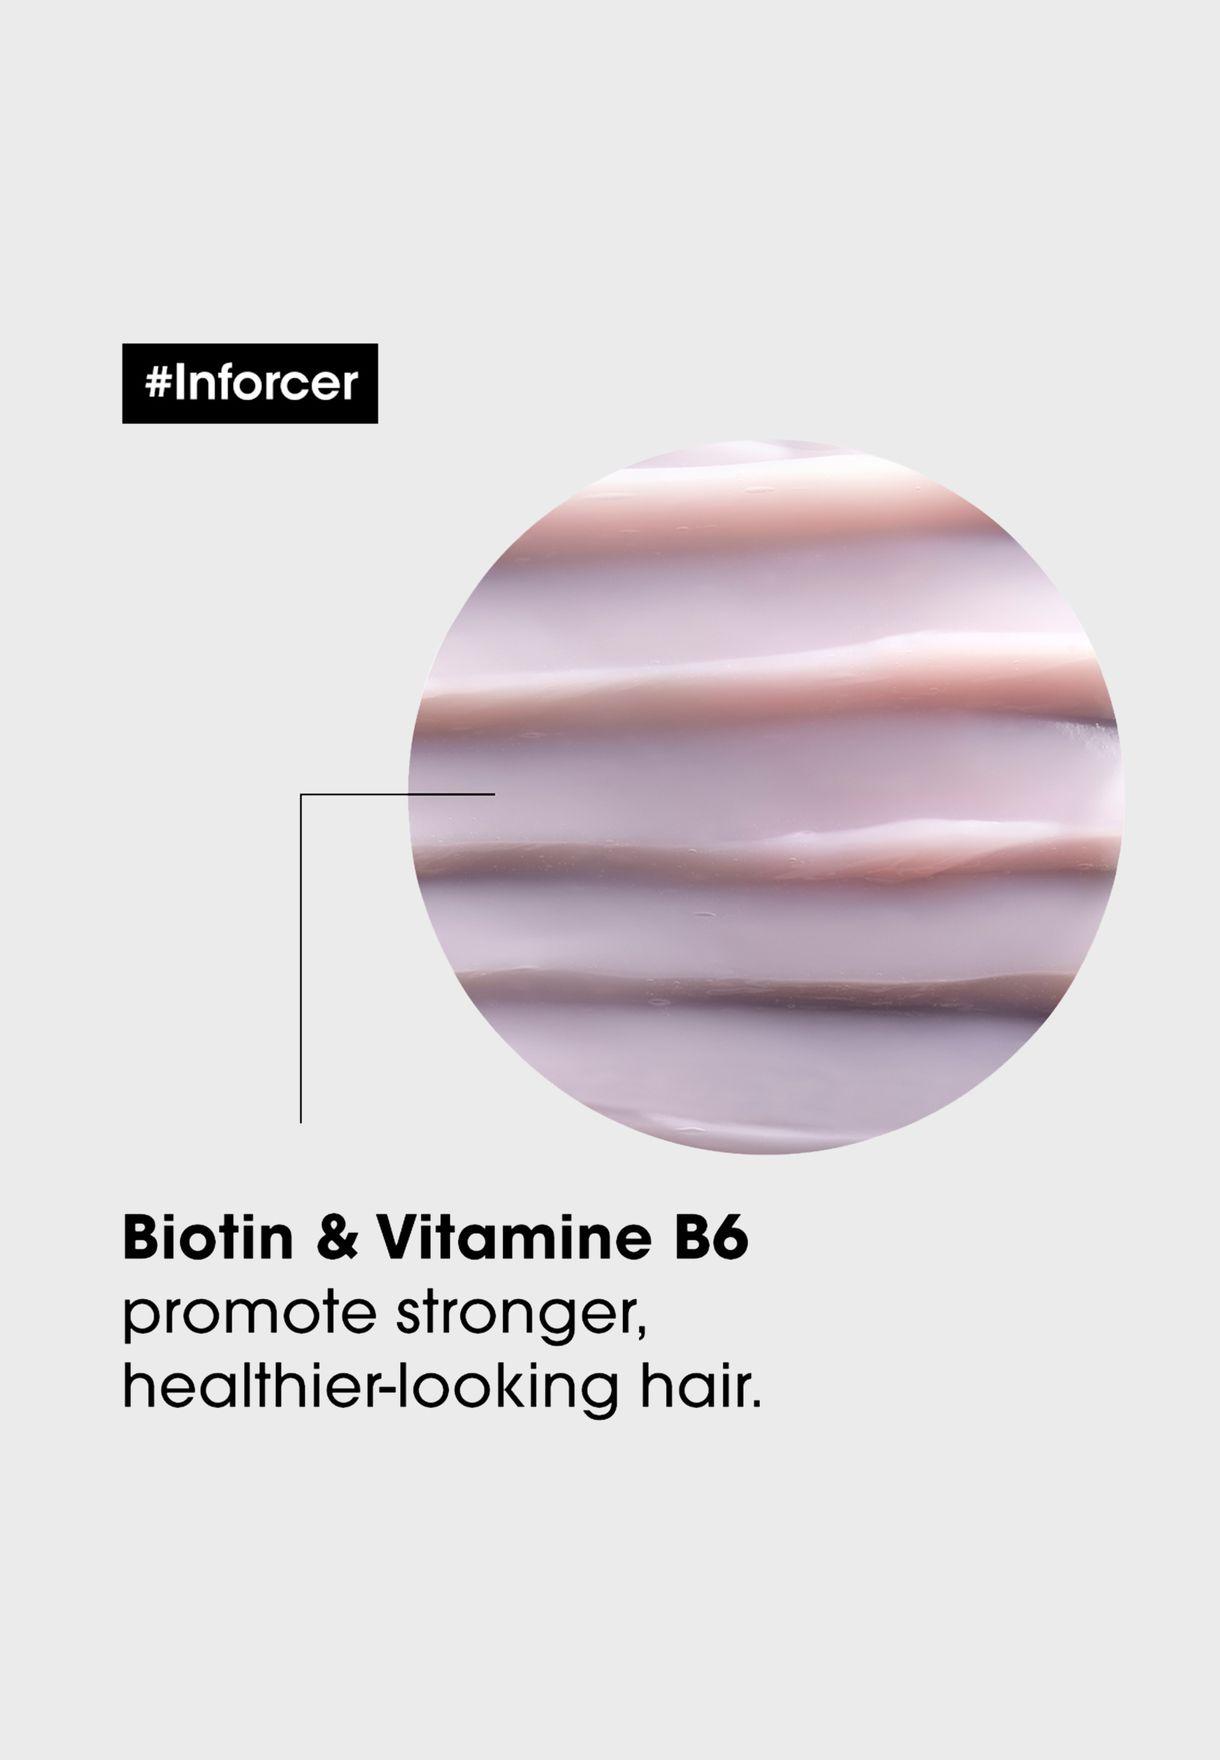 Serie Expert - Inforcer Hair Masque